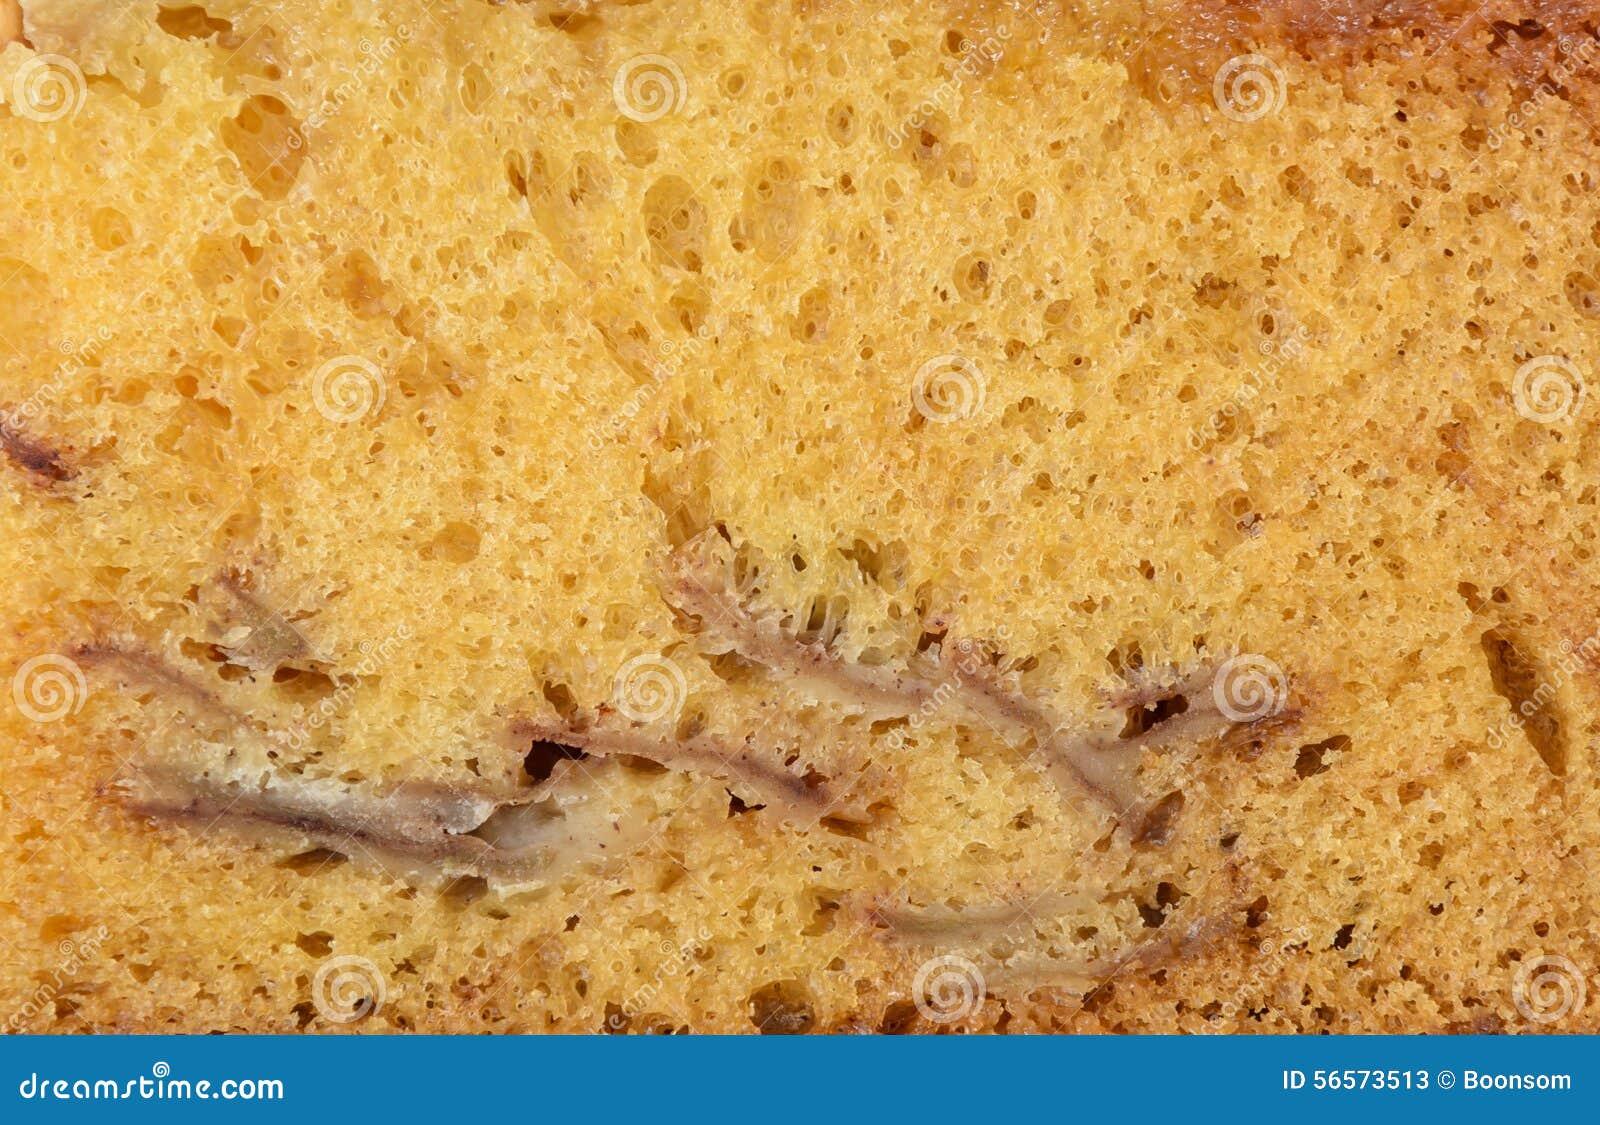 Download Μαλακό κέικ της Apple στοκ εικόνα. εικόνα από closeup - 56573513